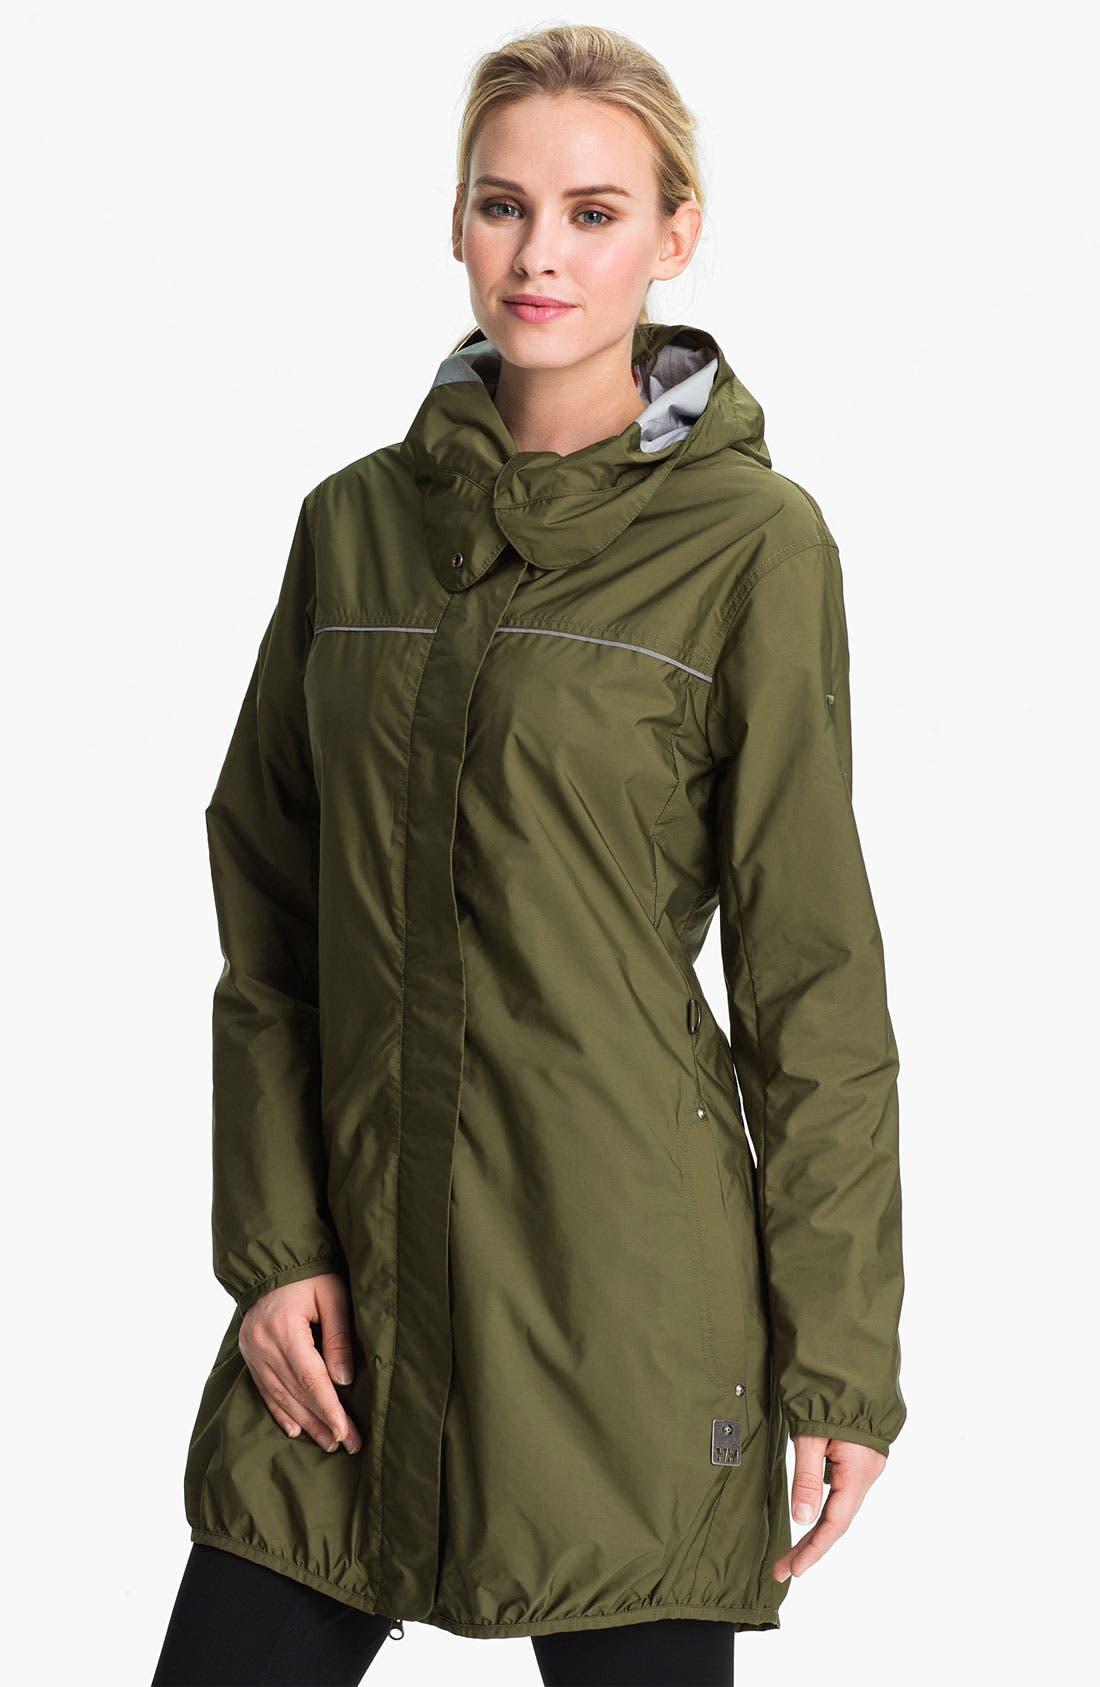 Alternate Image 1 Selected - Helly Hansen 'Embla' Weather Jacket